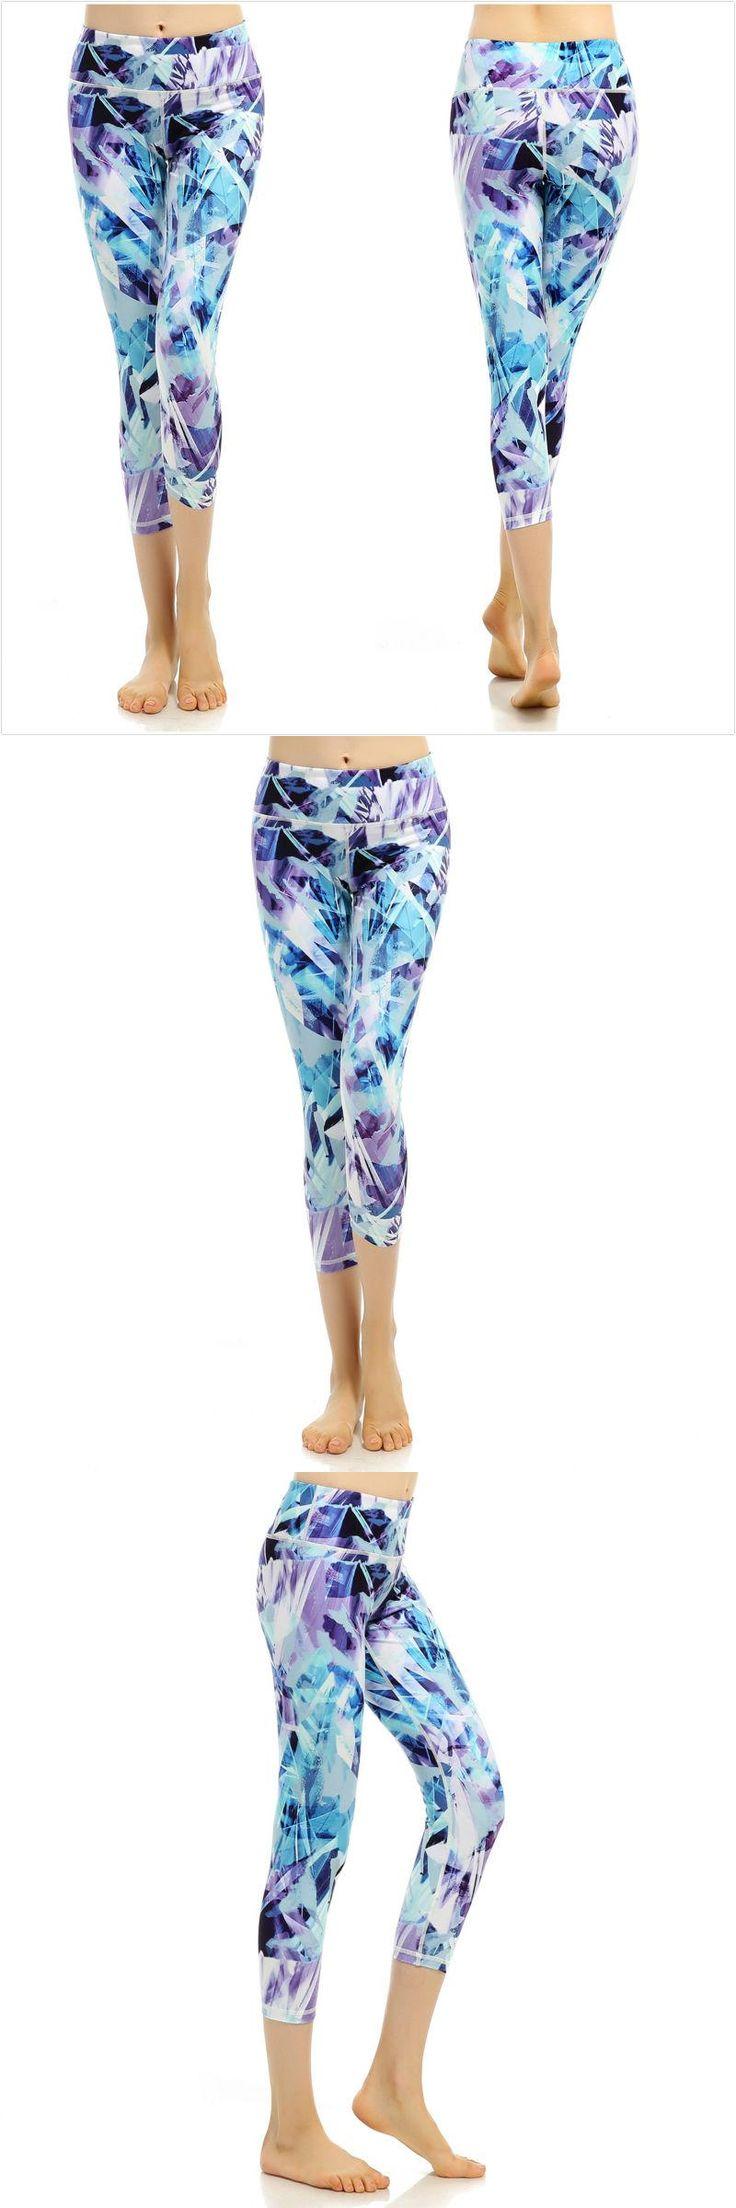 [Visit to Buy] Elastic Legging Capri Compression Tights Sports Yoga For Women High Waist Leggings Exerise Trousers Gym Clothing Bodyshape Suits #Advertisement